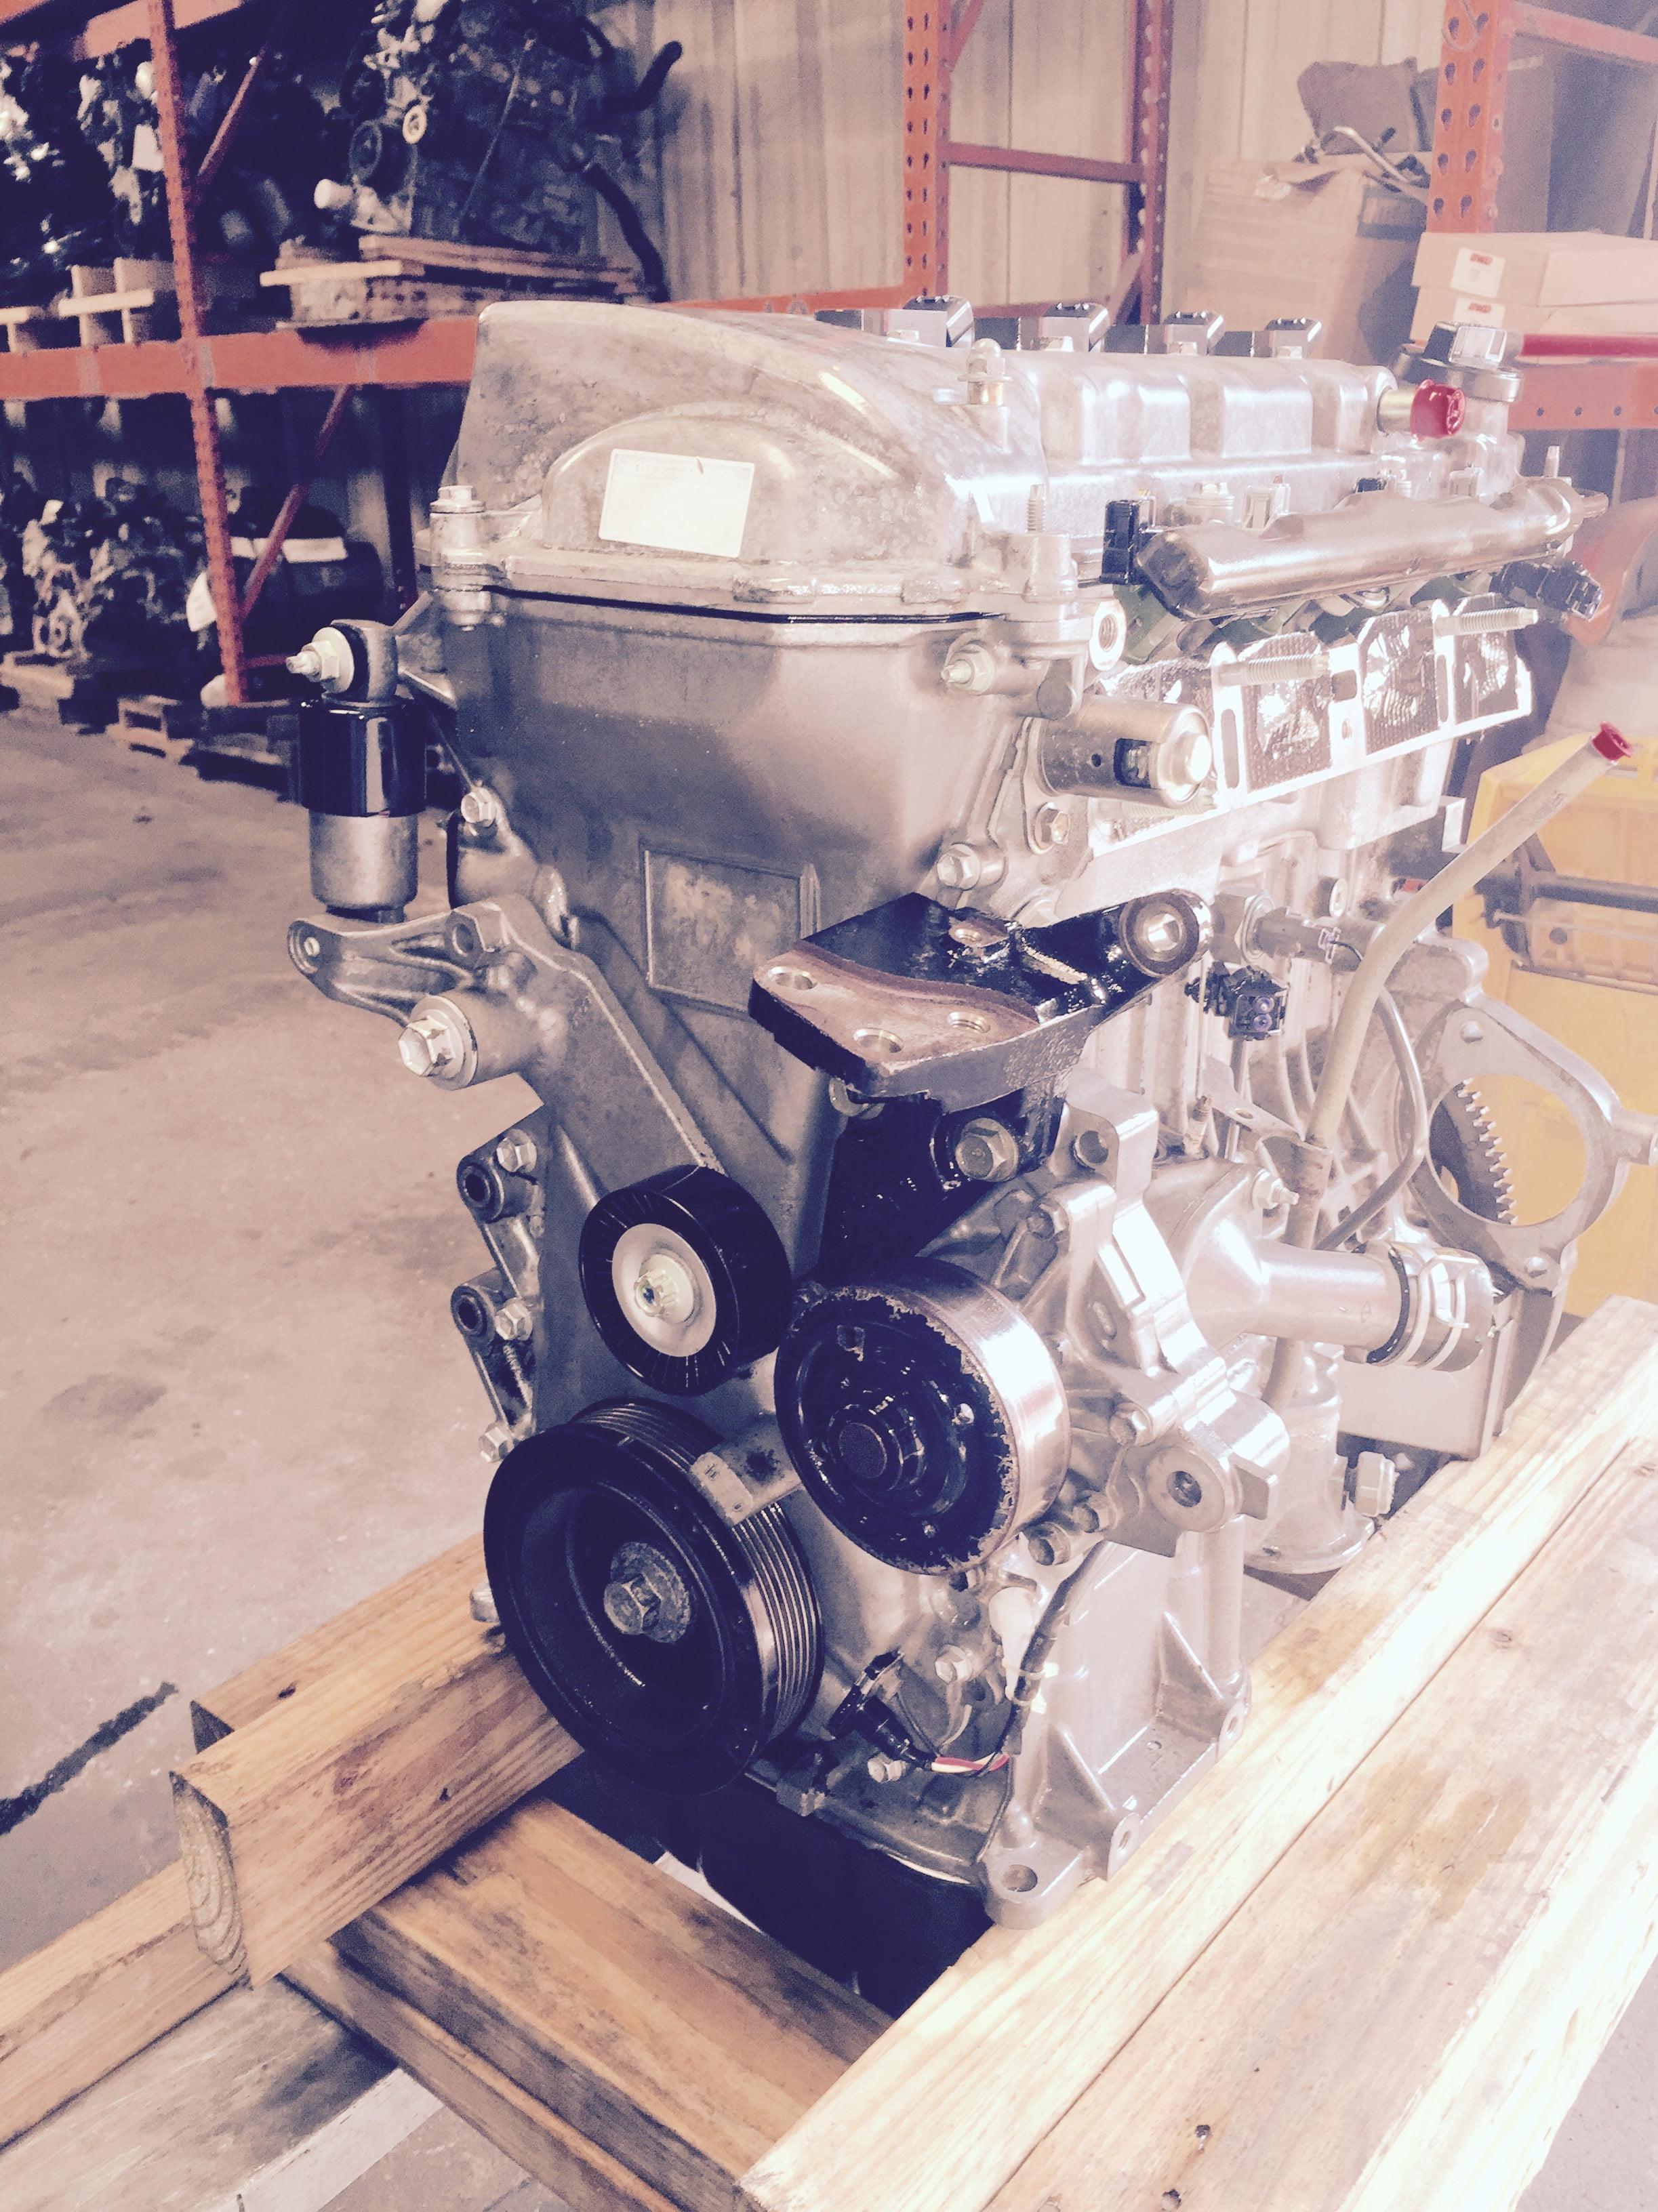 2000 Toyota Celica Gts Parts >> Toyota Celica GT Engine 1.8L 2000 2001 2002 2003 2004 2005 ...